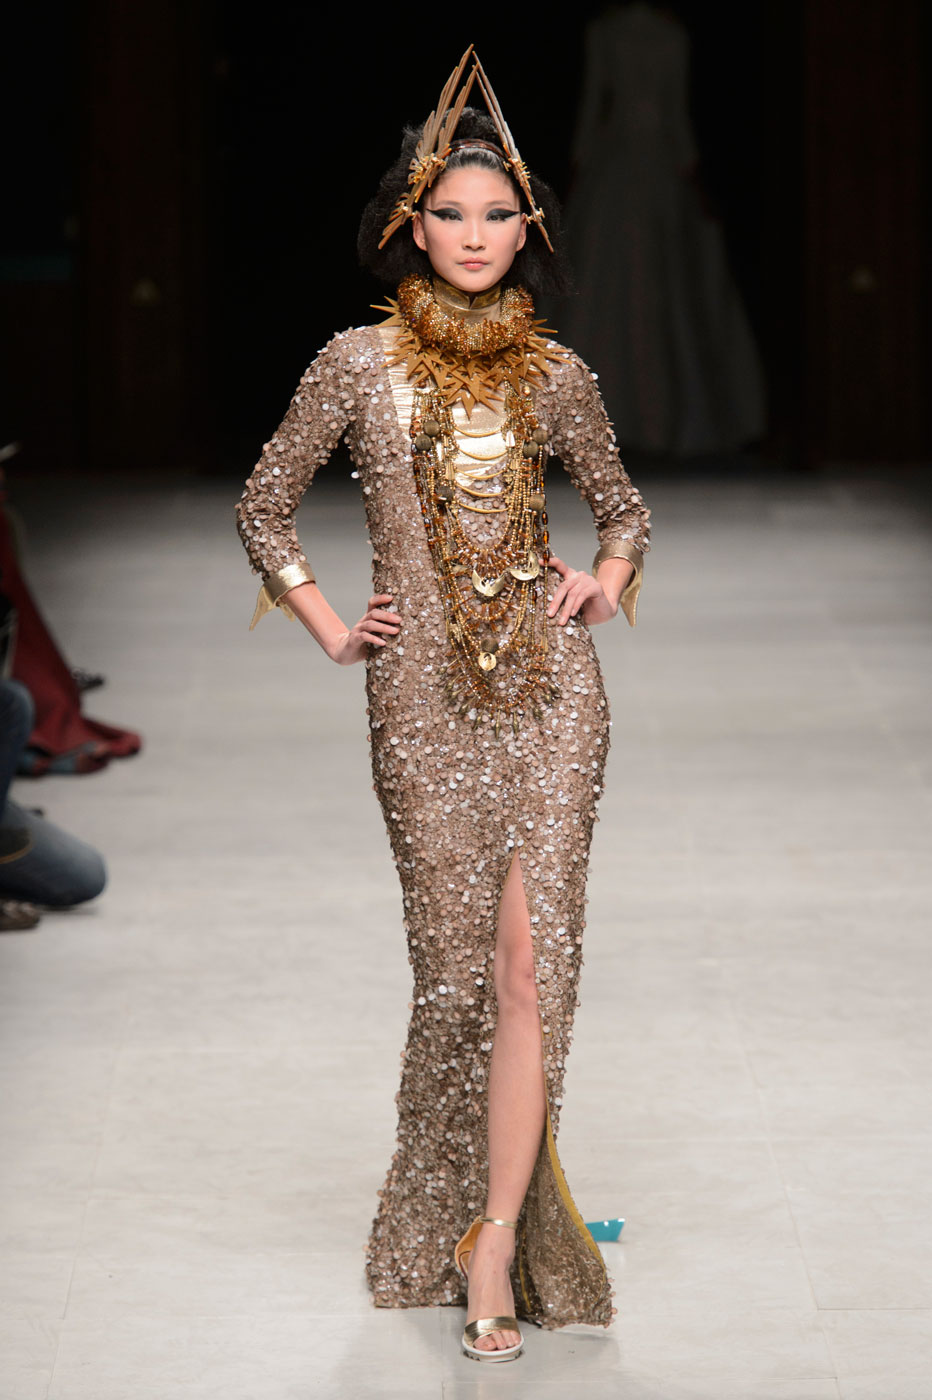 Julien-Fournie-Prive-fashion-runway-show-haute-couture-paris-spring-2015-the-impression-58